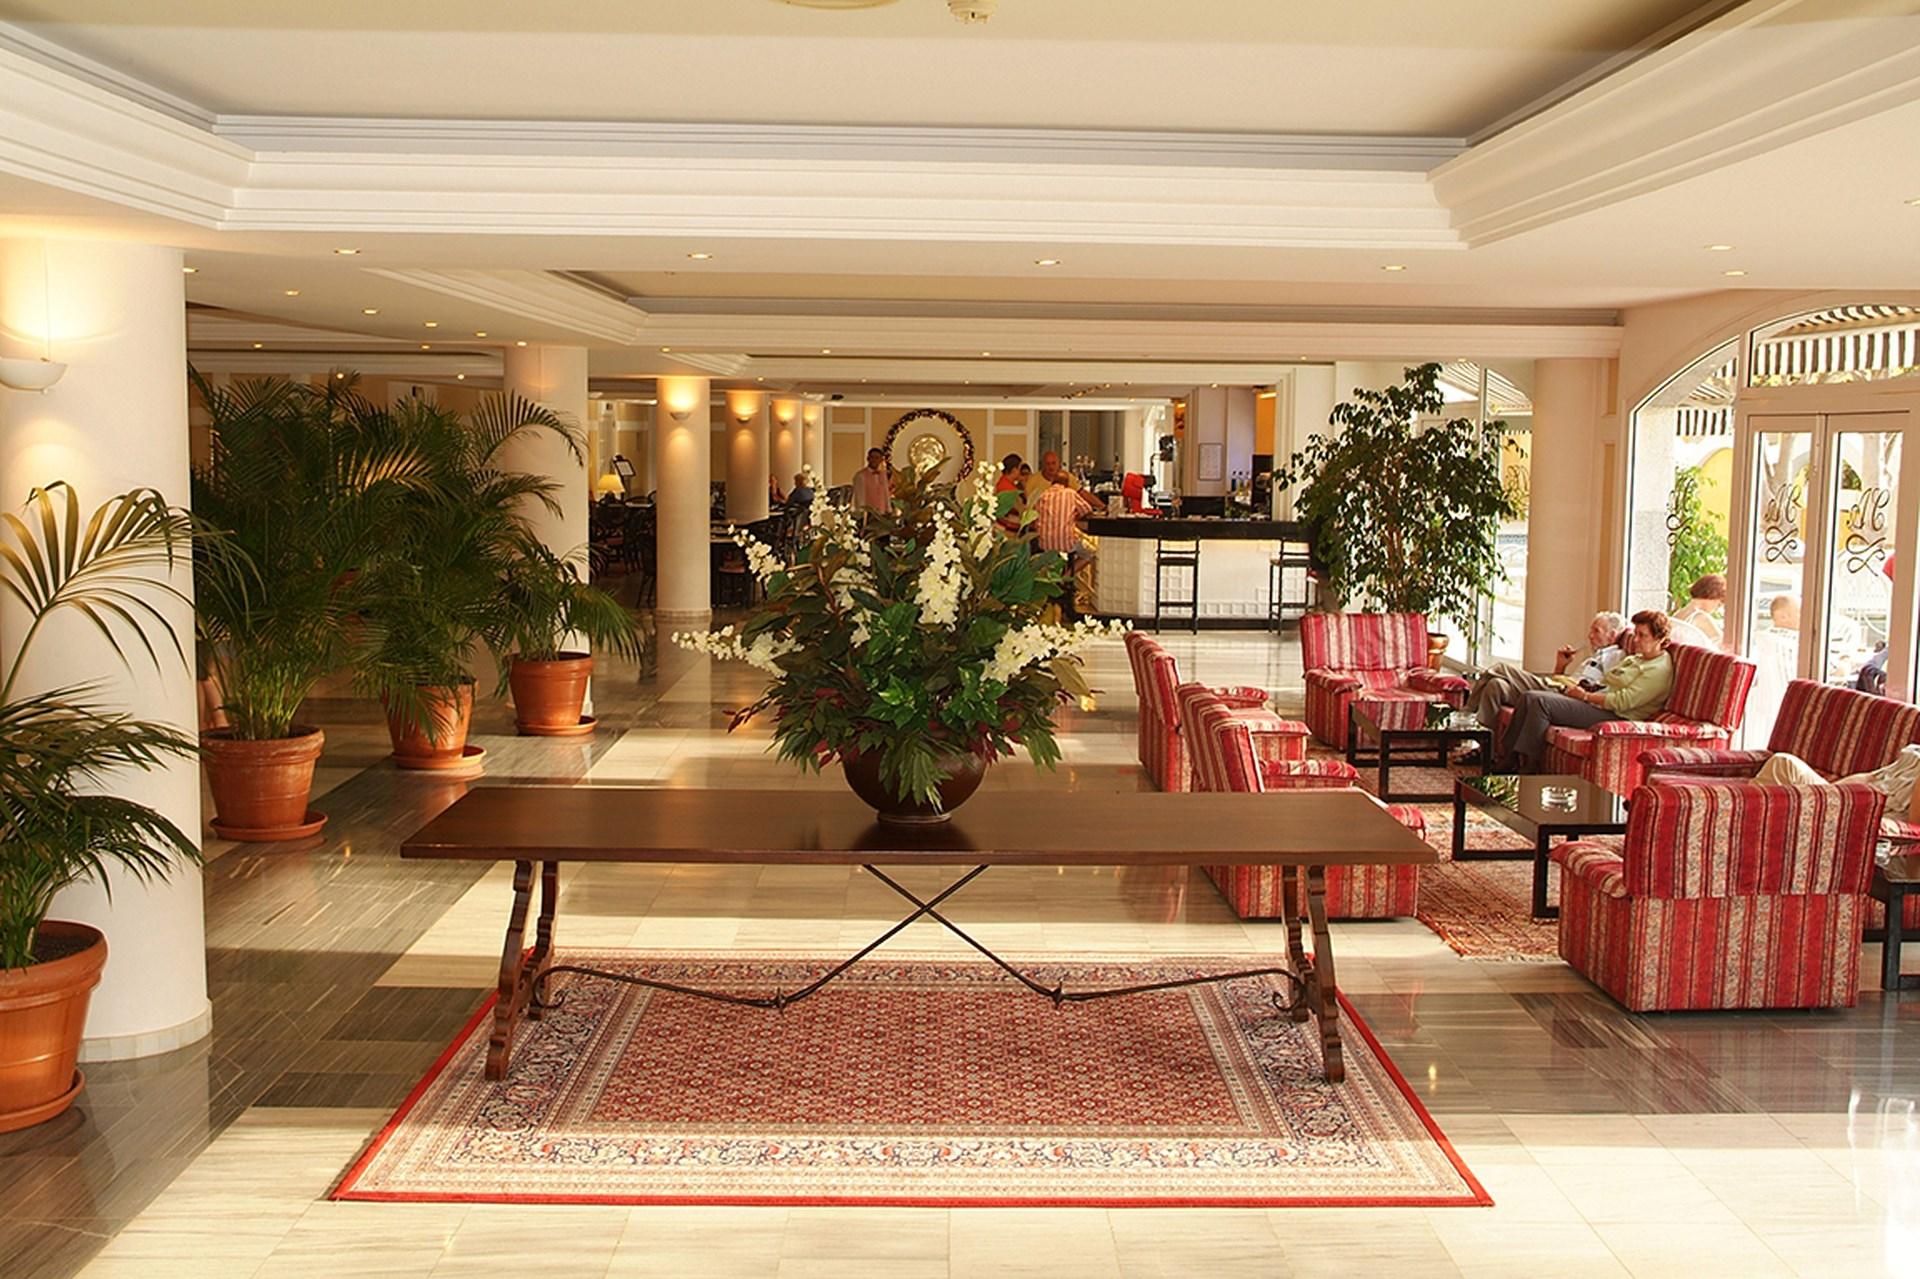 Augusta Berlin Hotel